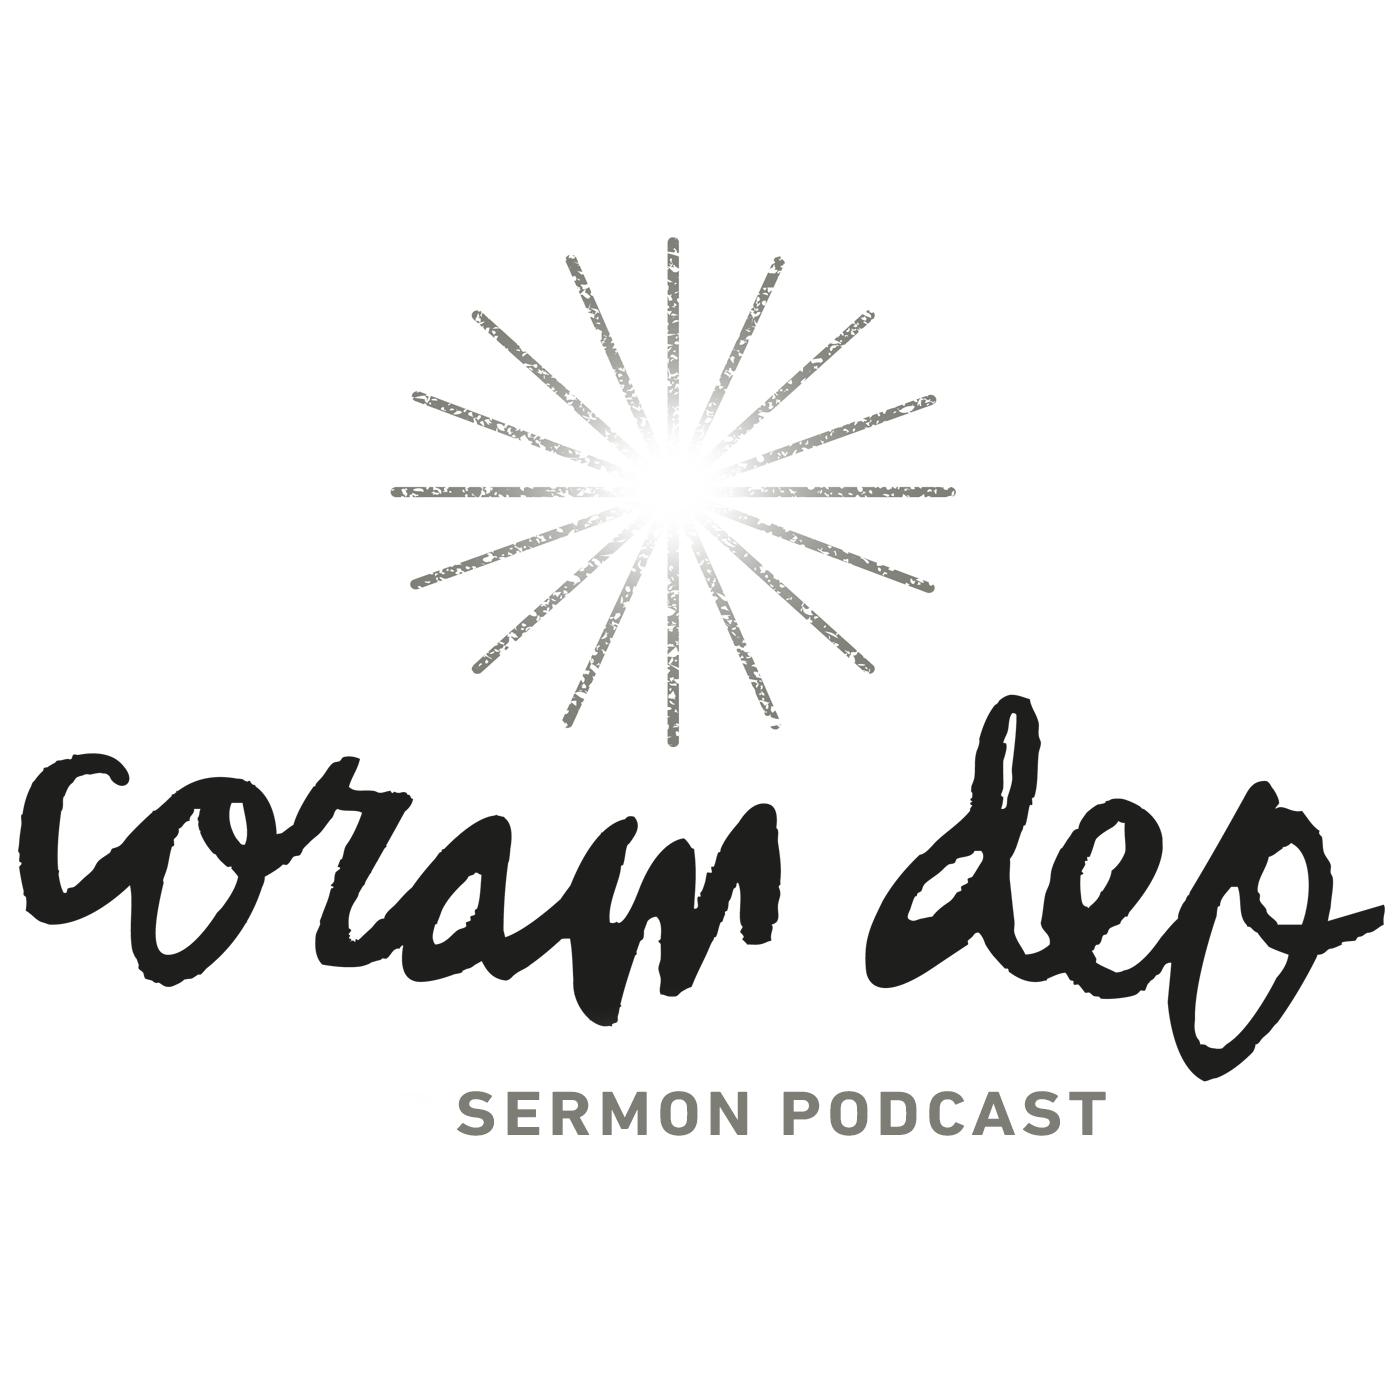 Coram Deo Sermons